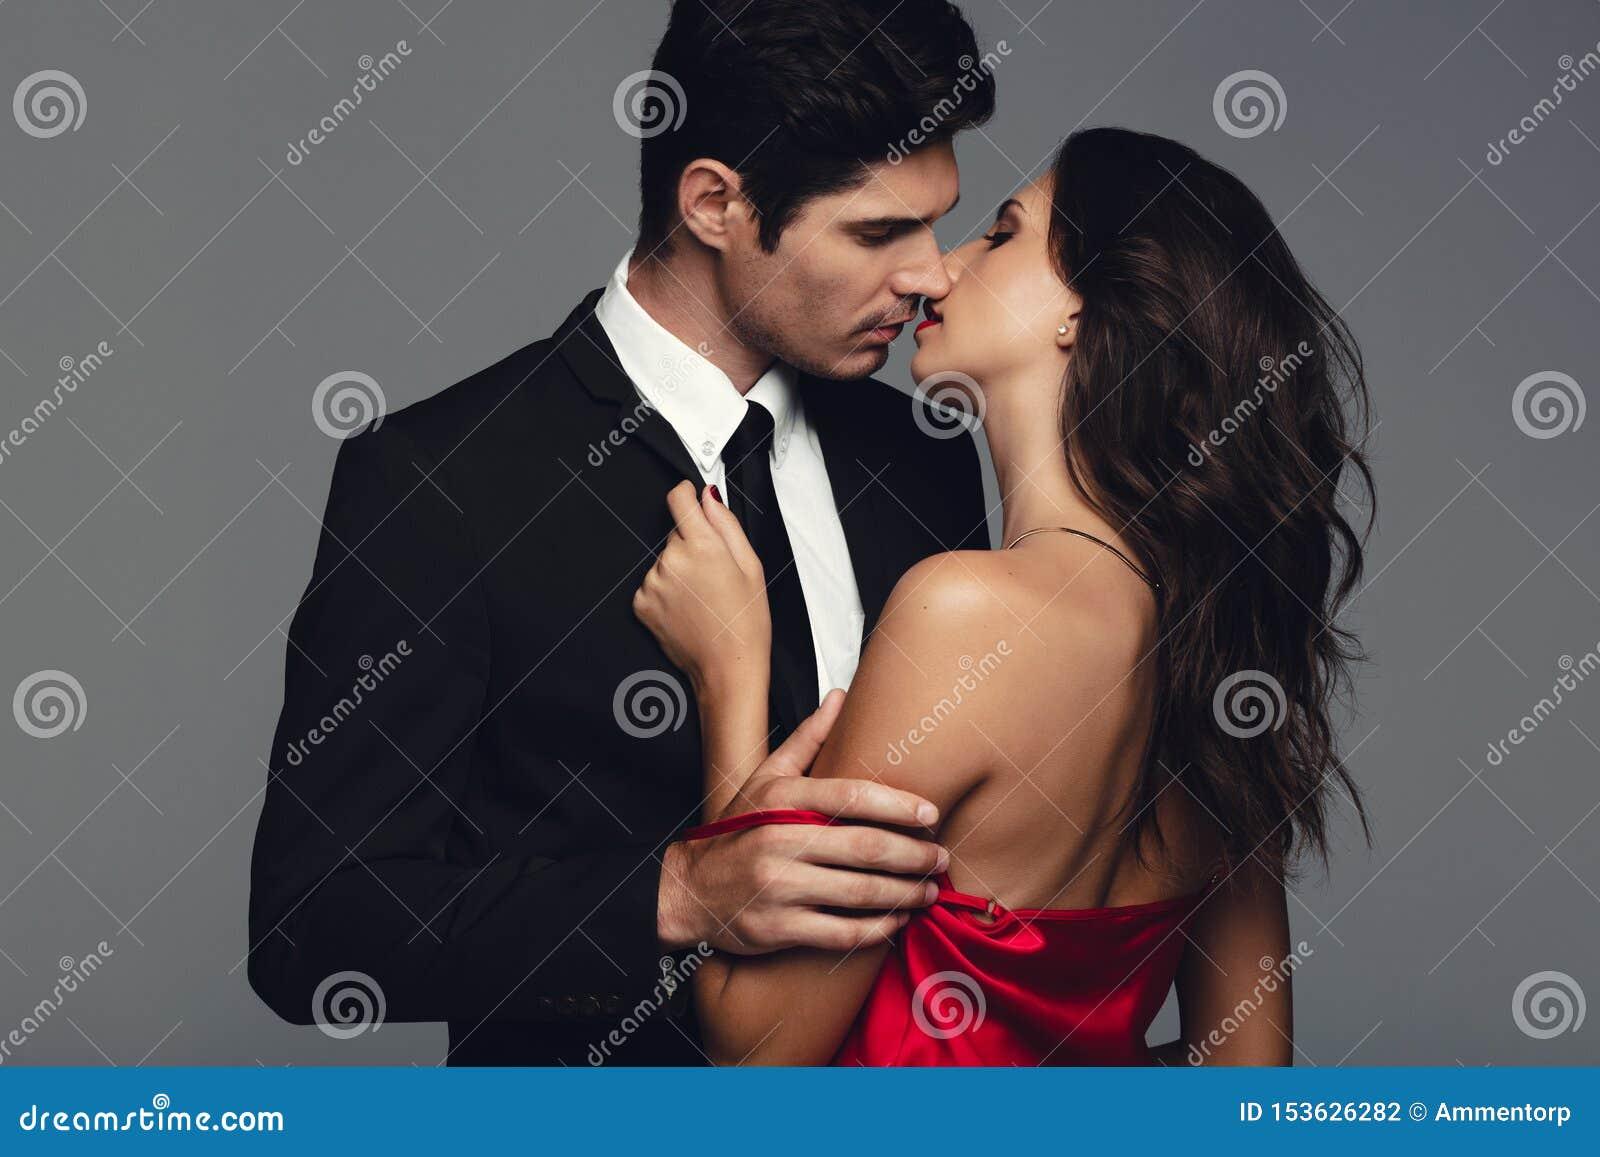 Men seduce do why women 16 Clothing